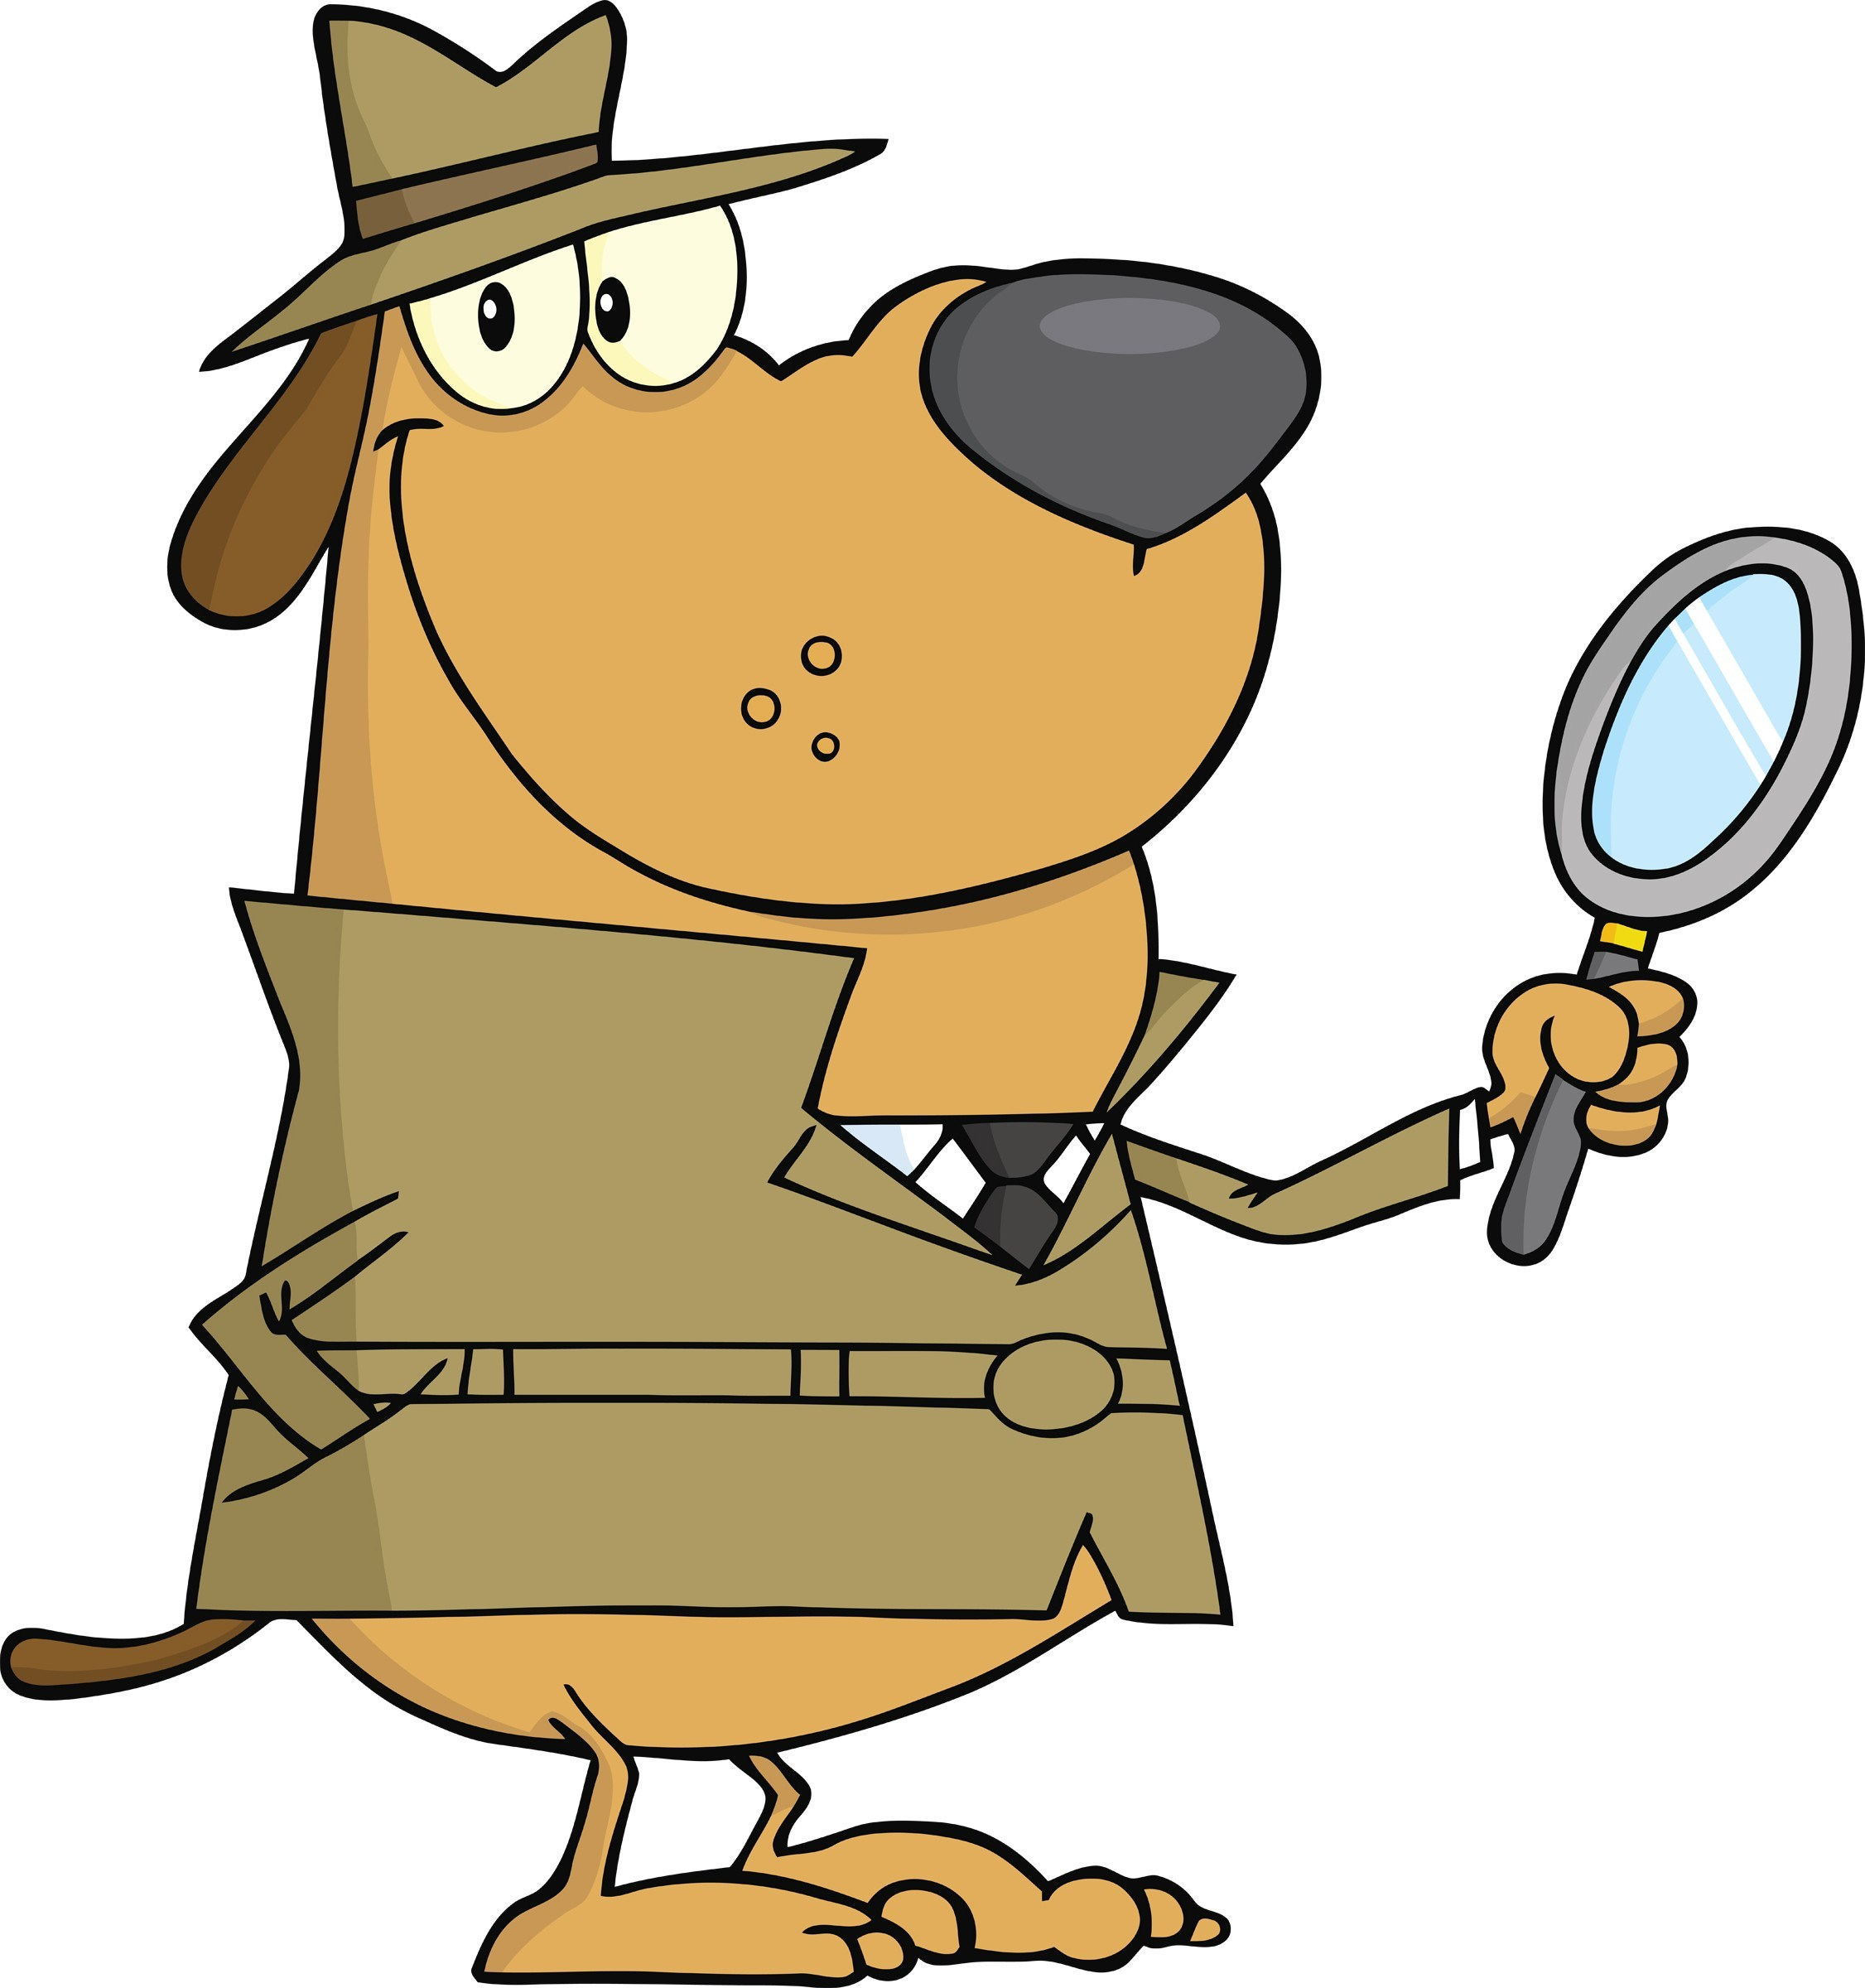 Dog detective clipart 3 » Clipart Portal.